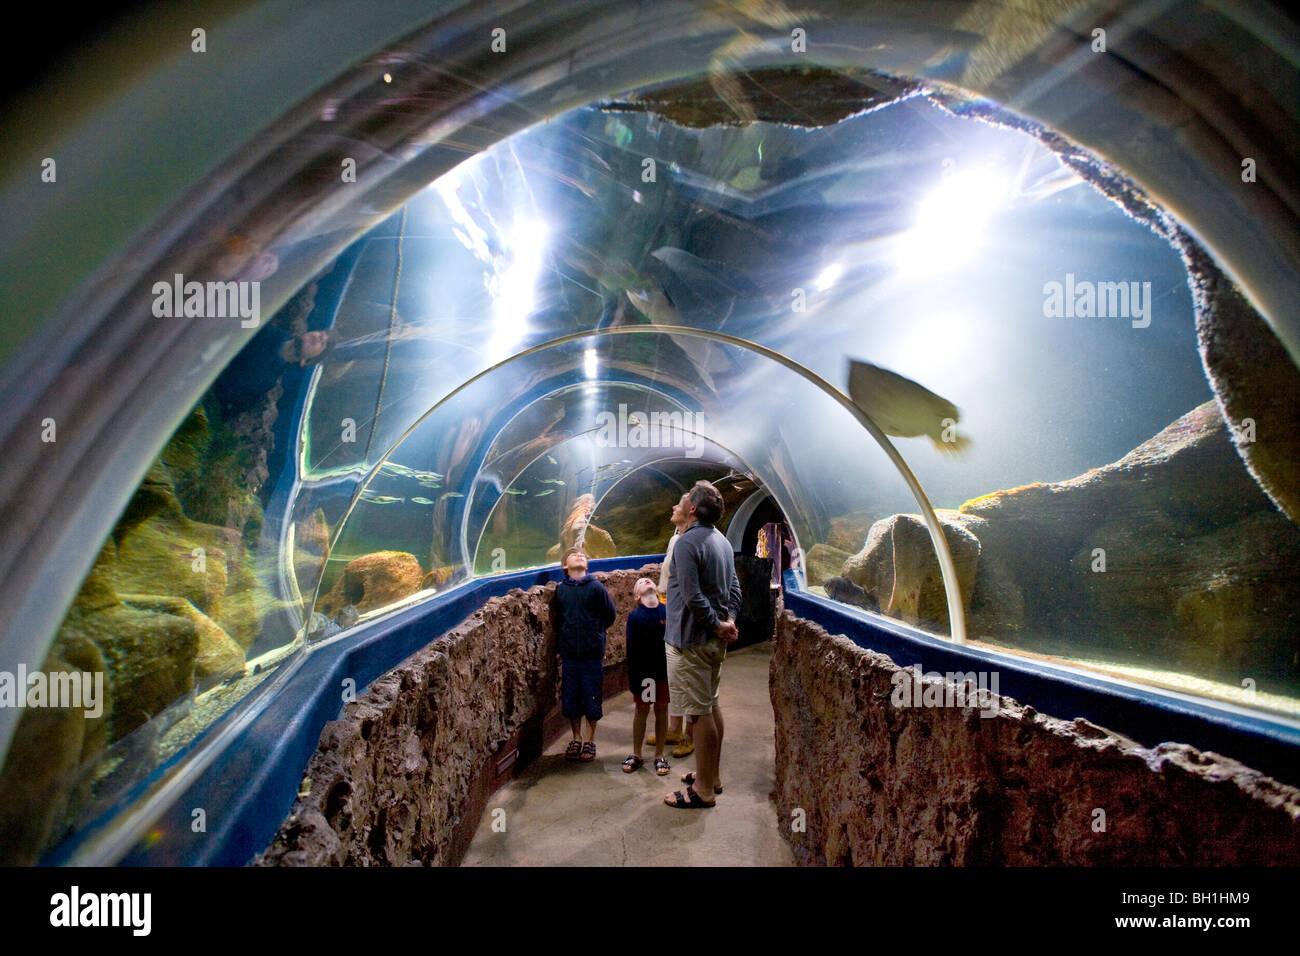 People visiting Aquarium, Westerland, Sylt Island, Schleswig-Holstein, Germany Stock Photo